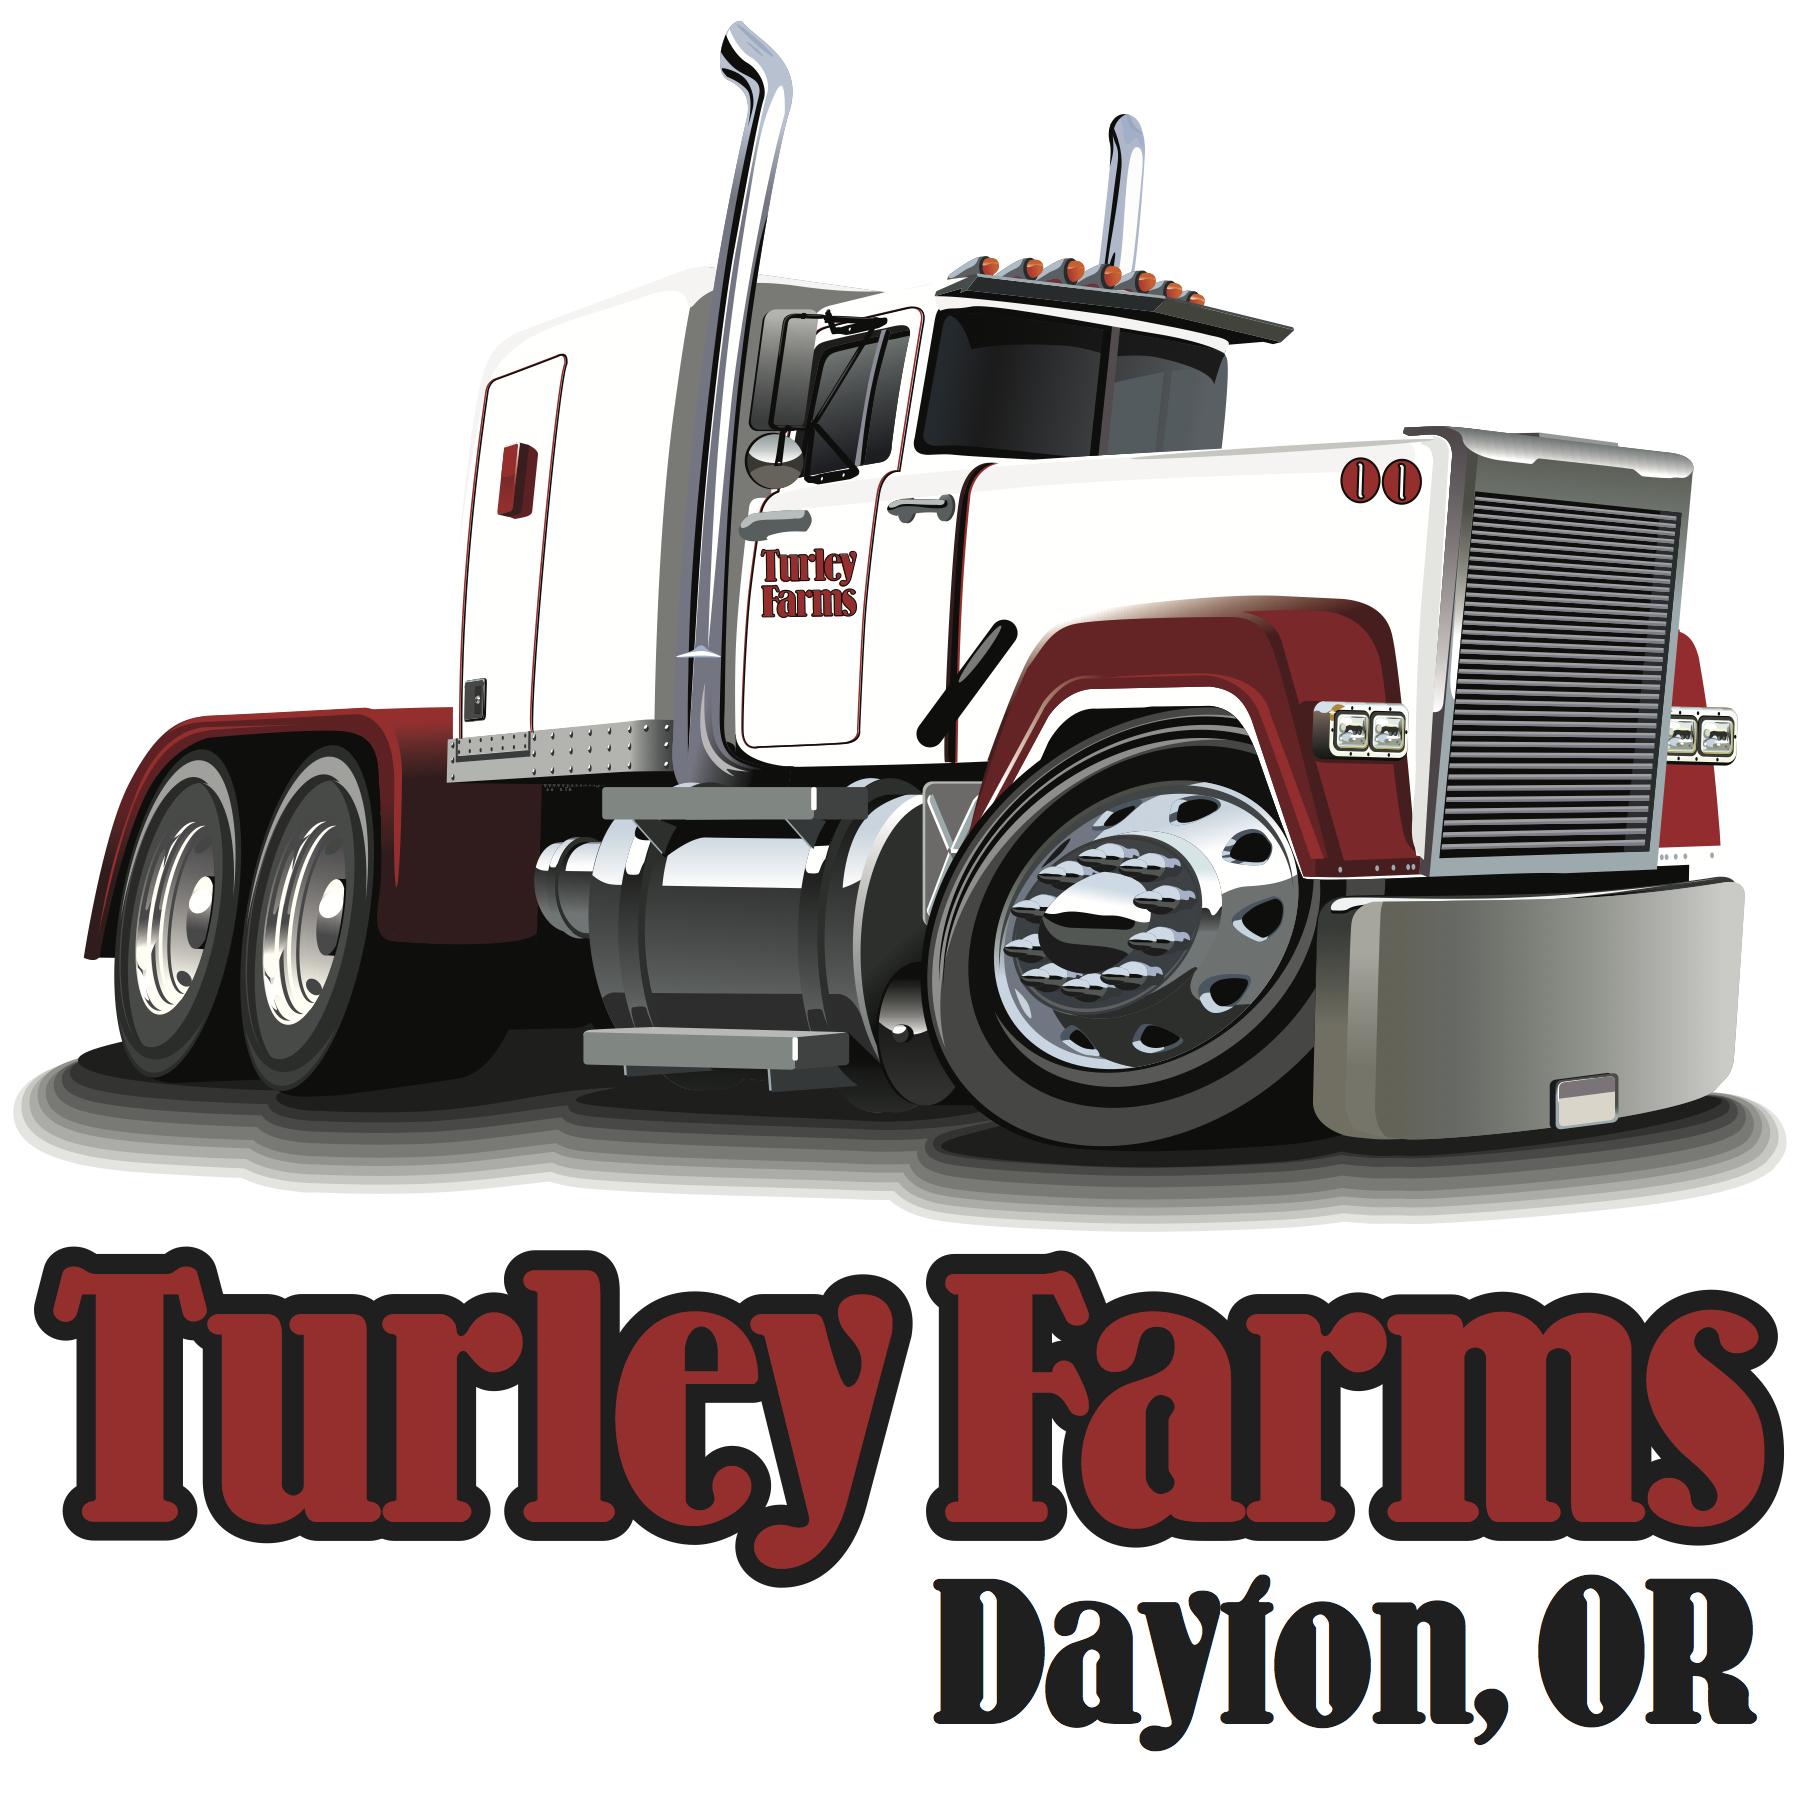 Turley-Farms-Logo